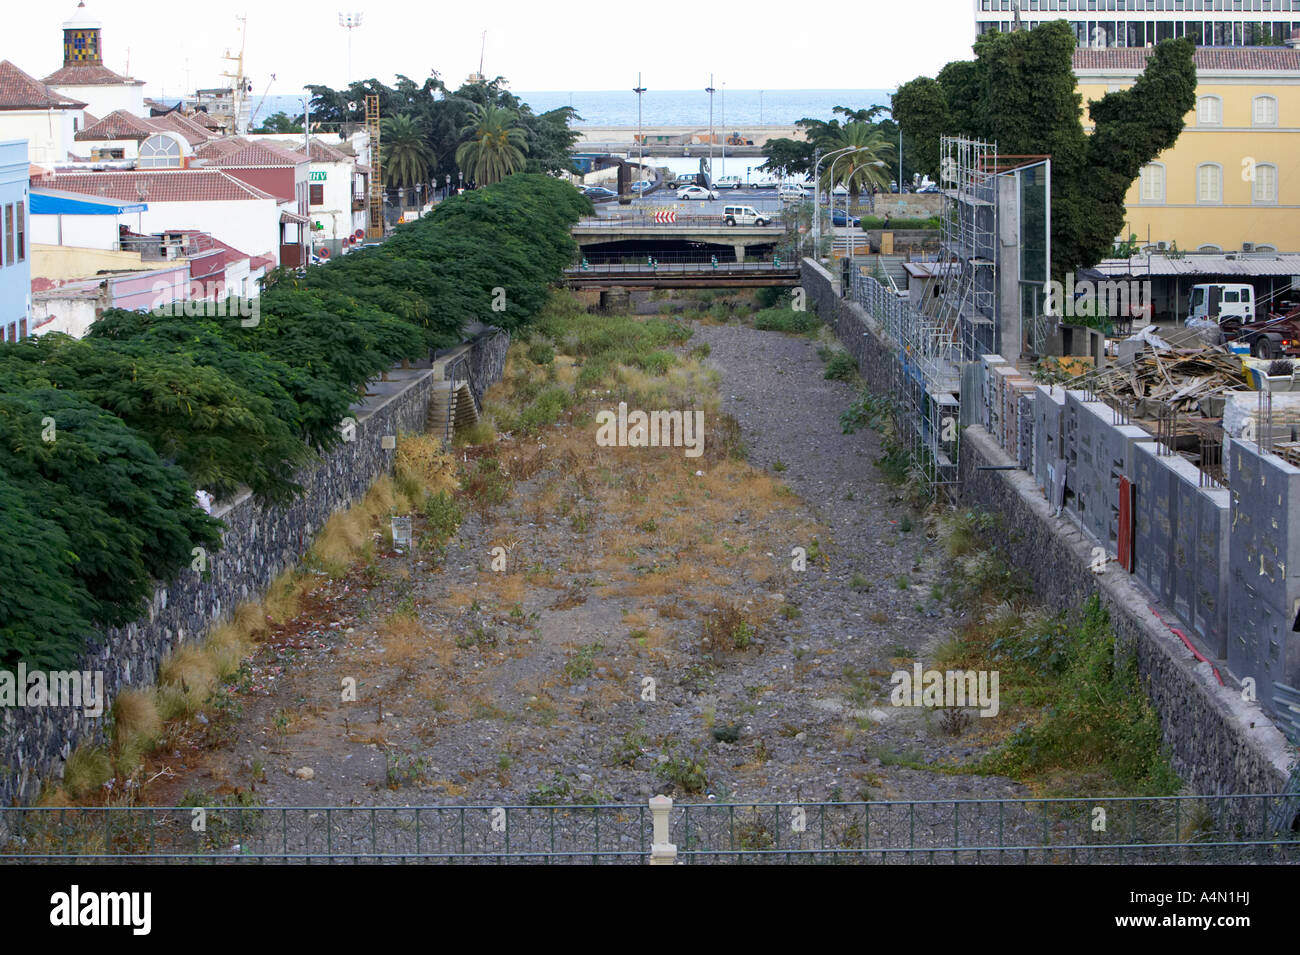 dried up river bed of Barranco De Santos running through the middle of Santa Cruz de Tenerife in the evening Stock Photo